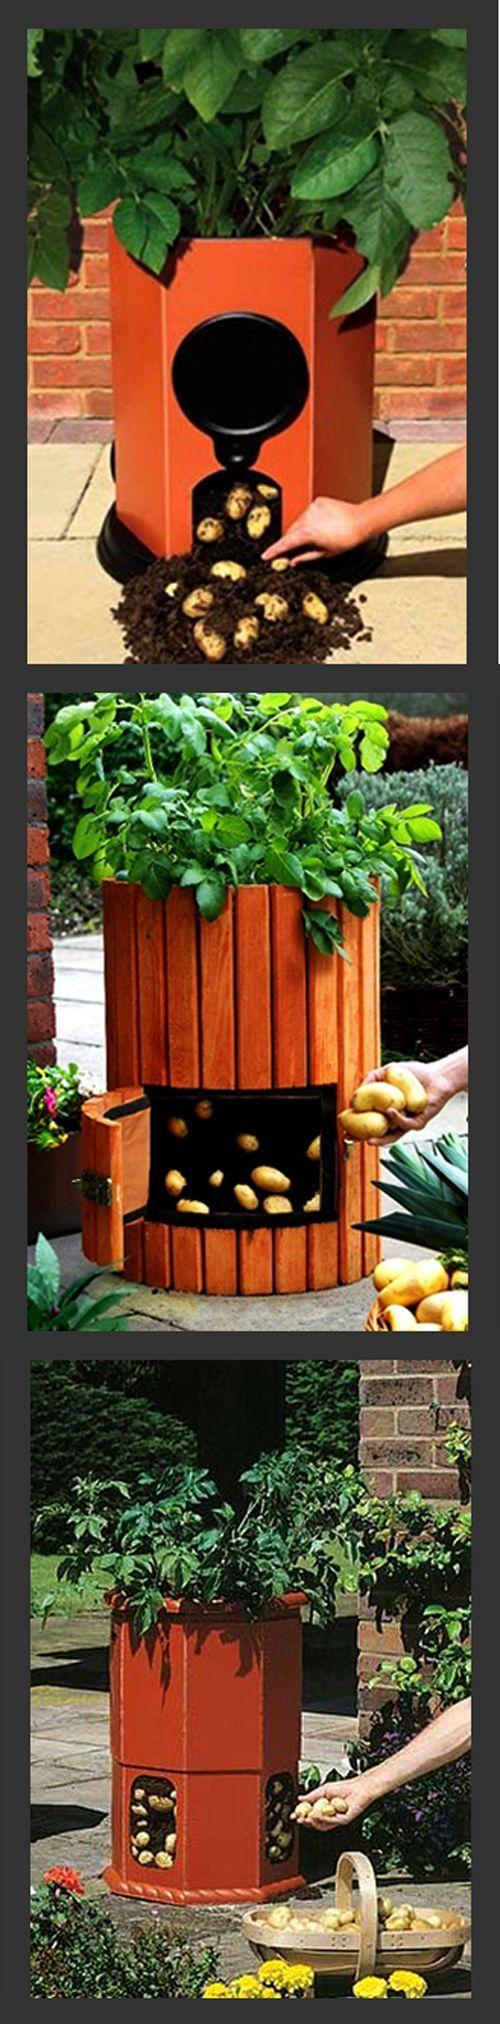 Potato growing made easy: